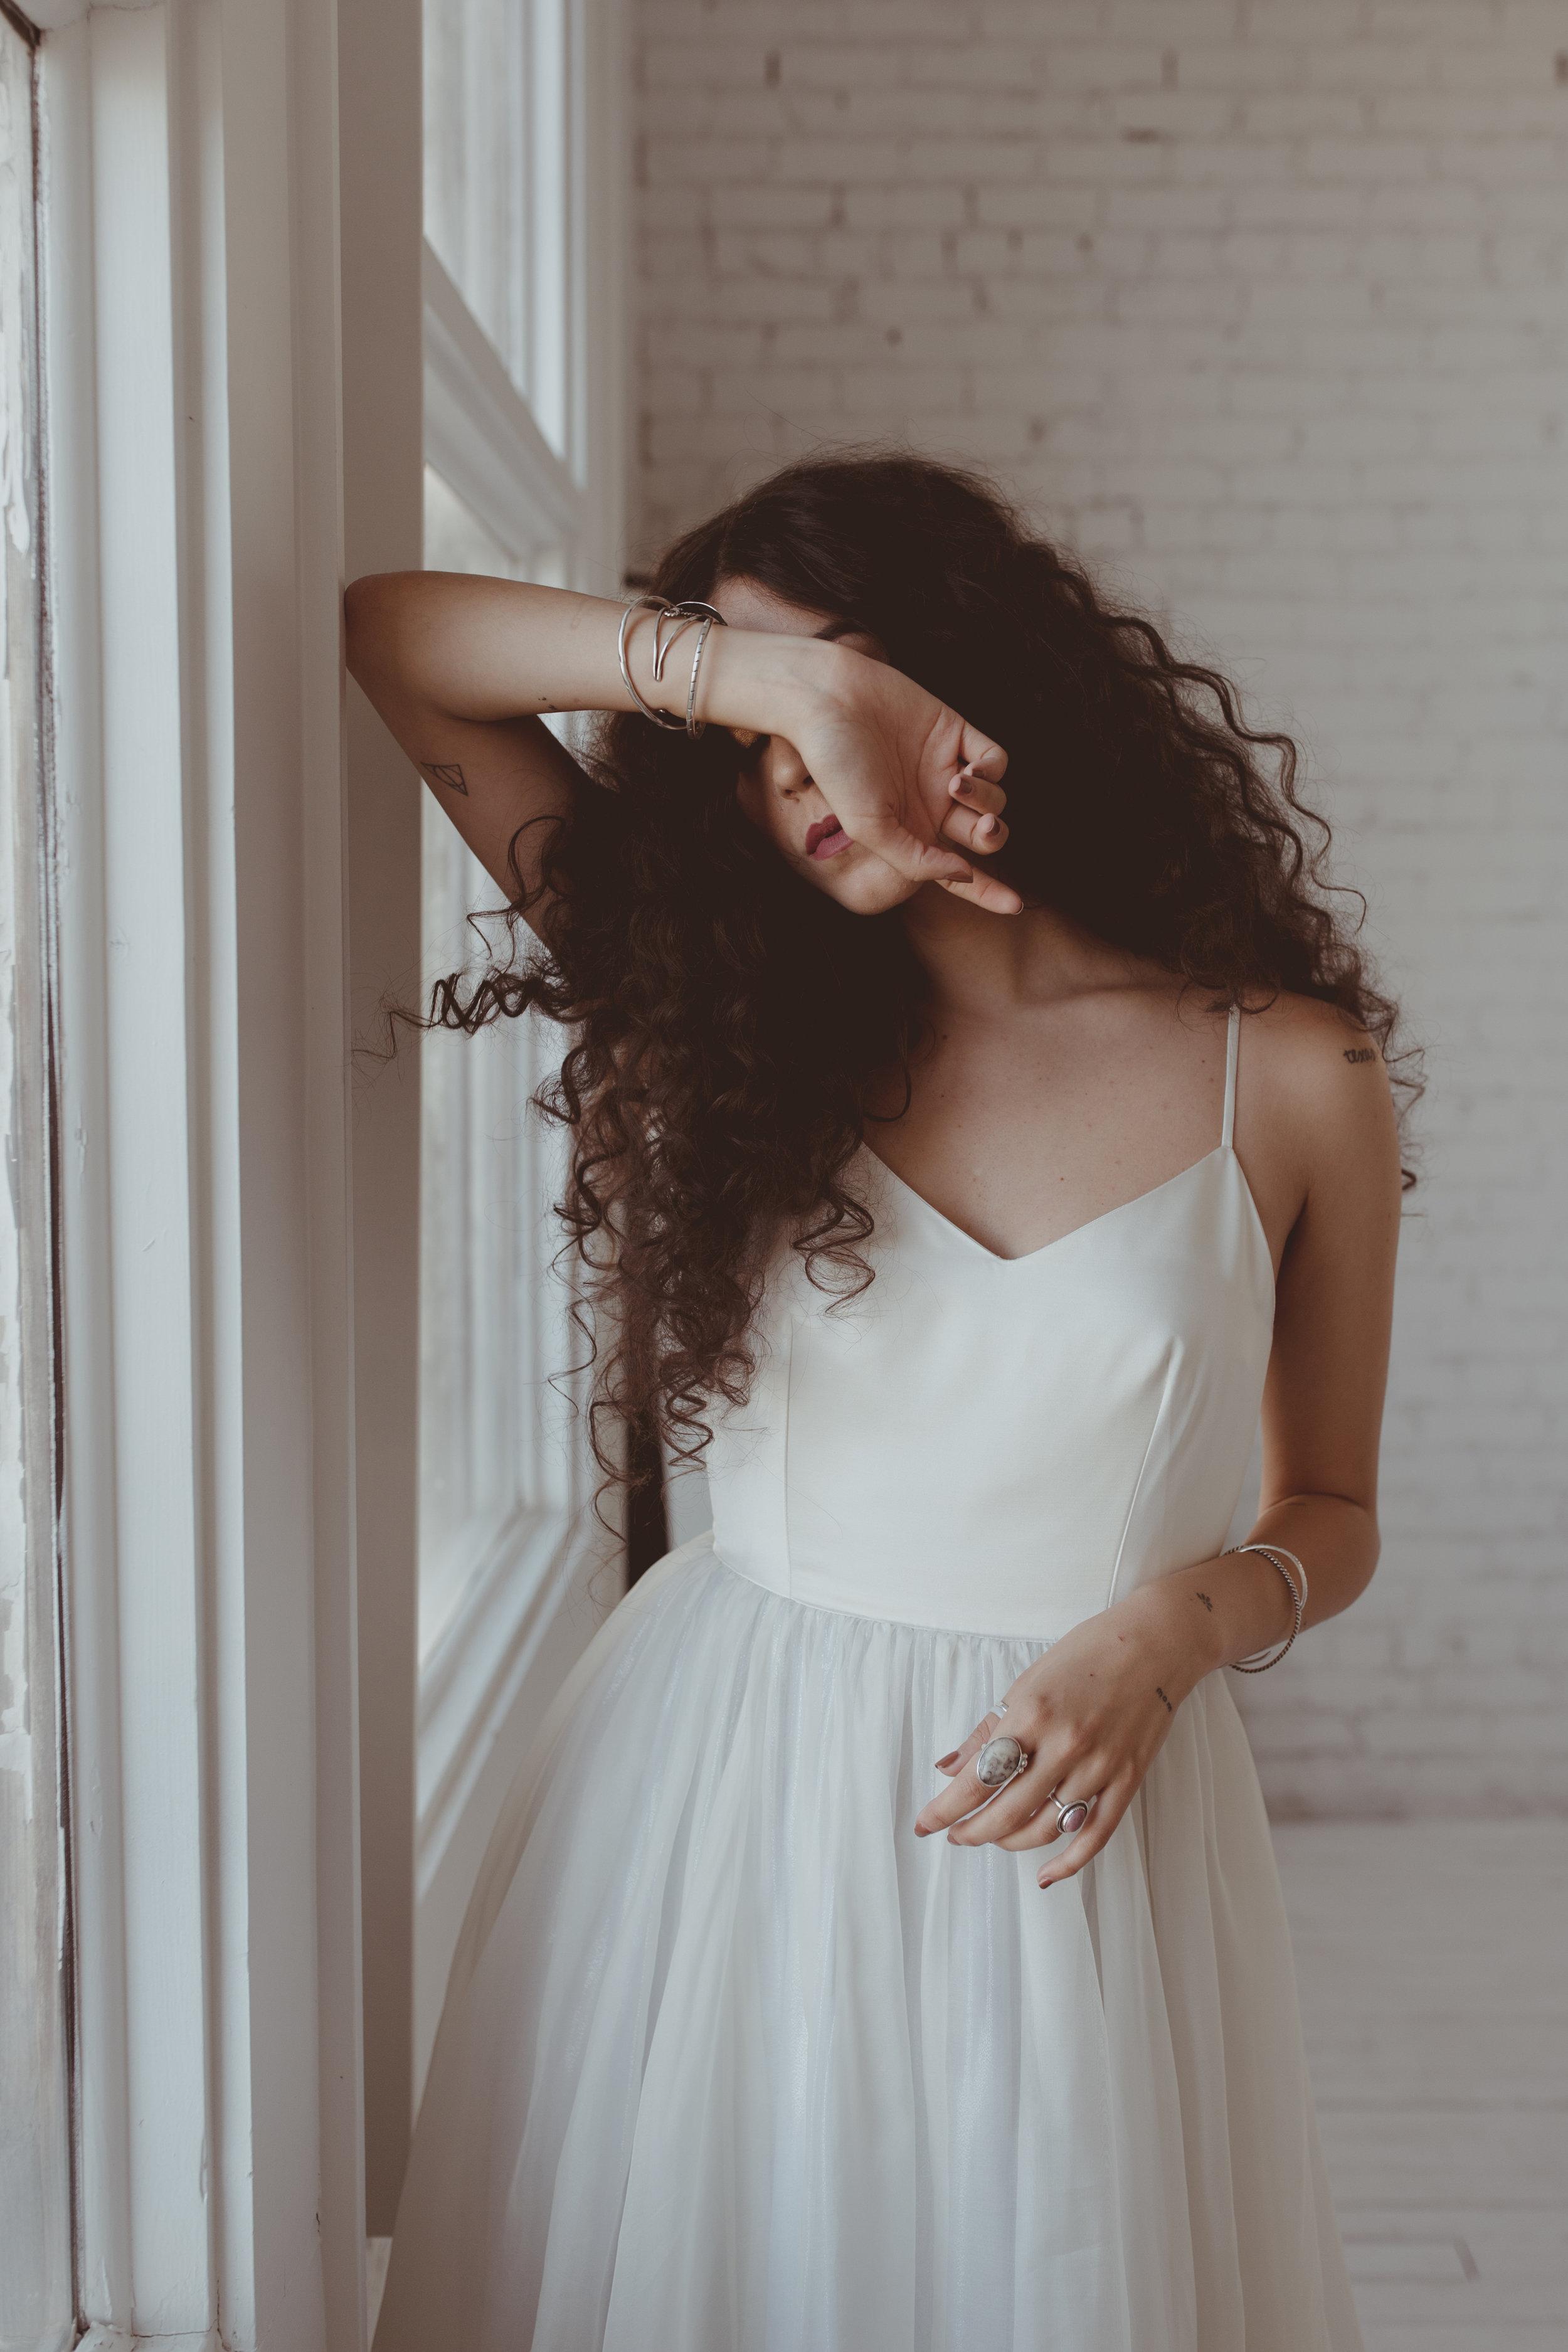 Wedding Dress Chantel Lauren Parton Silver